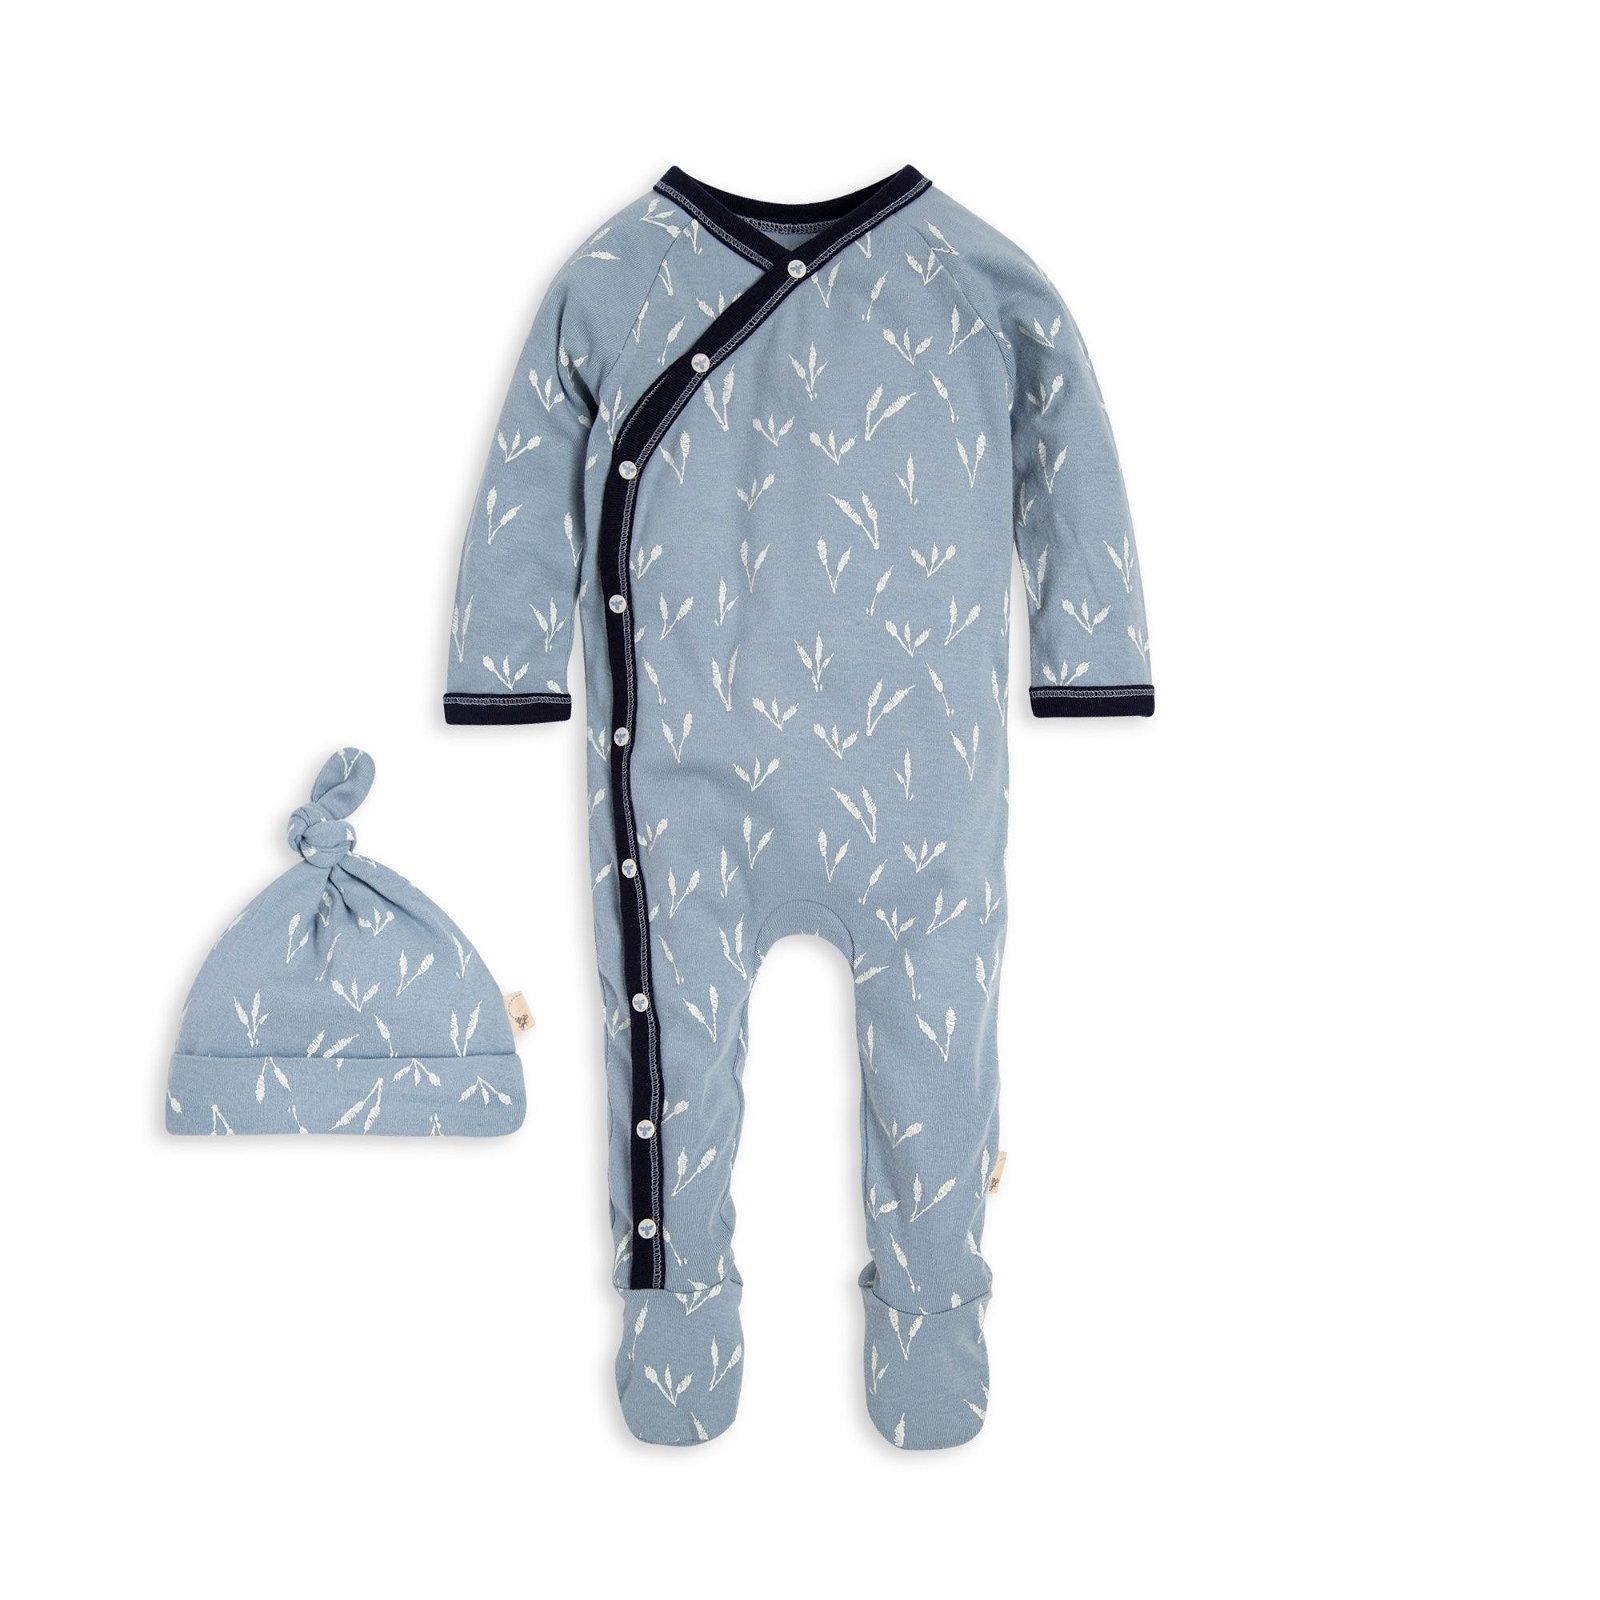 Tall Grass Organic Baby Jumpsuit & Hat Set